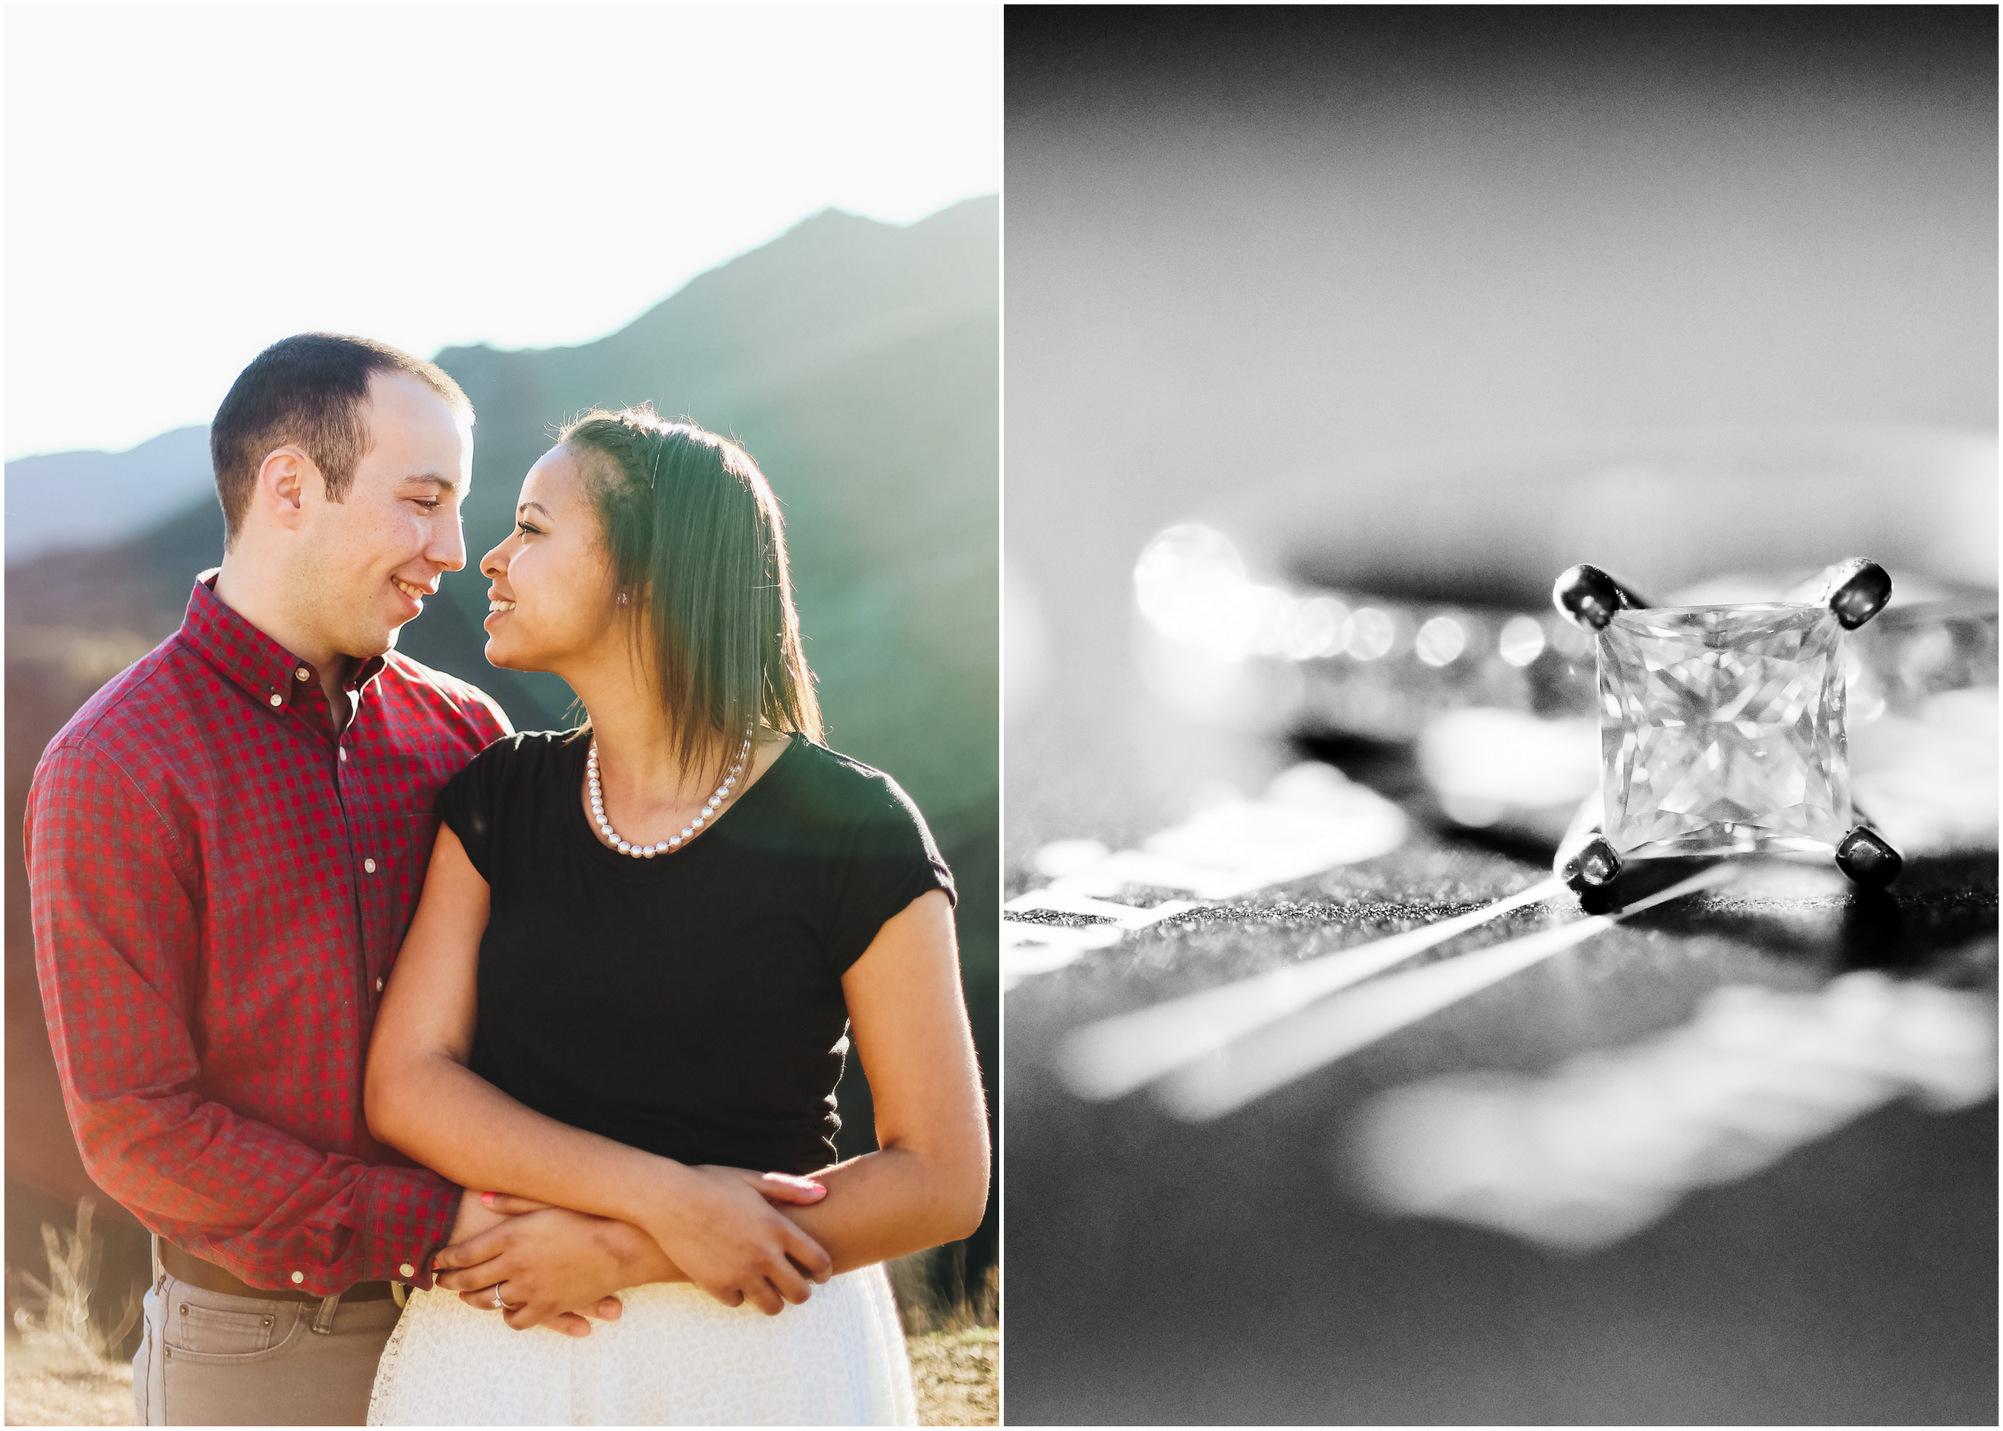 engagement photos (custom designed diamond ring!)